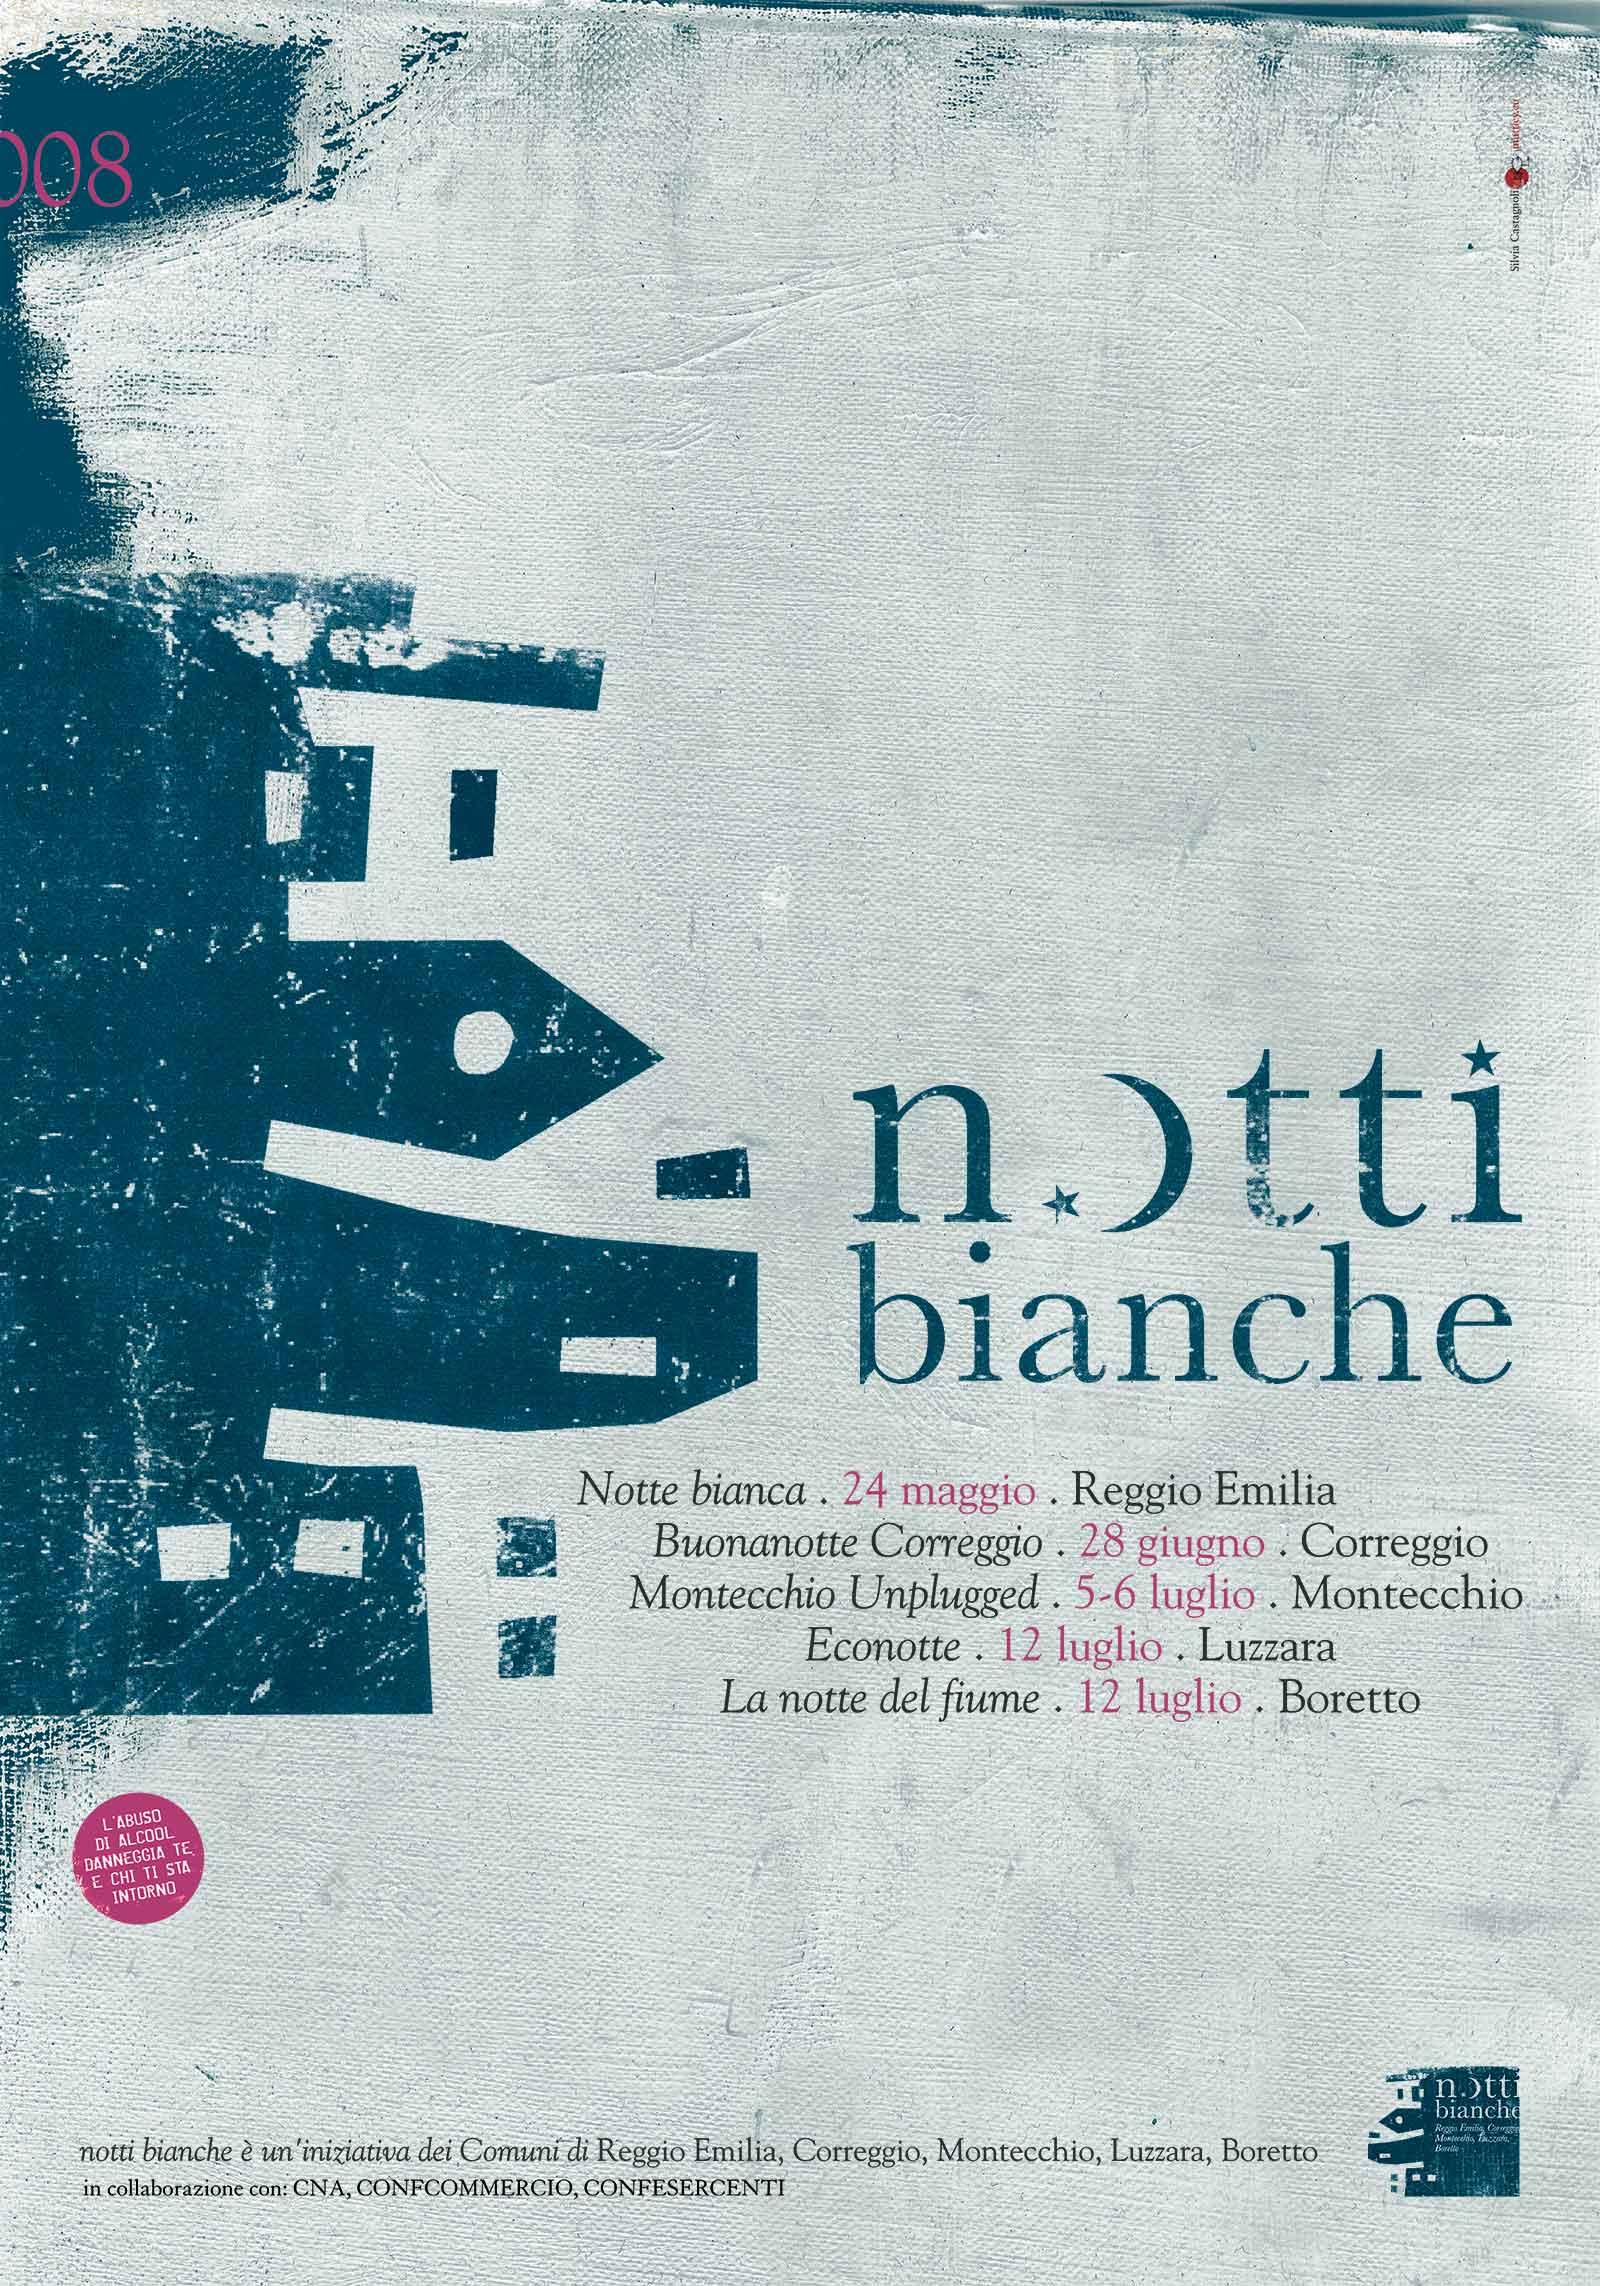 NOTTI-BIANCHE-manifesto-2008